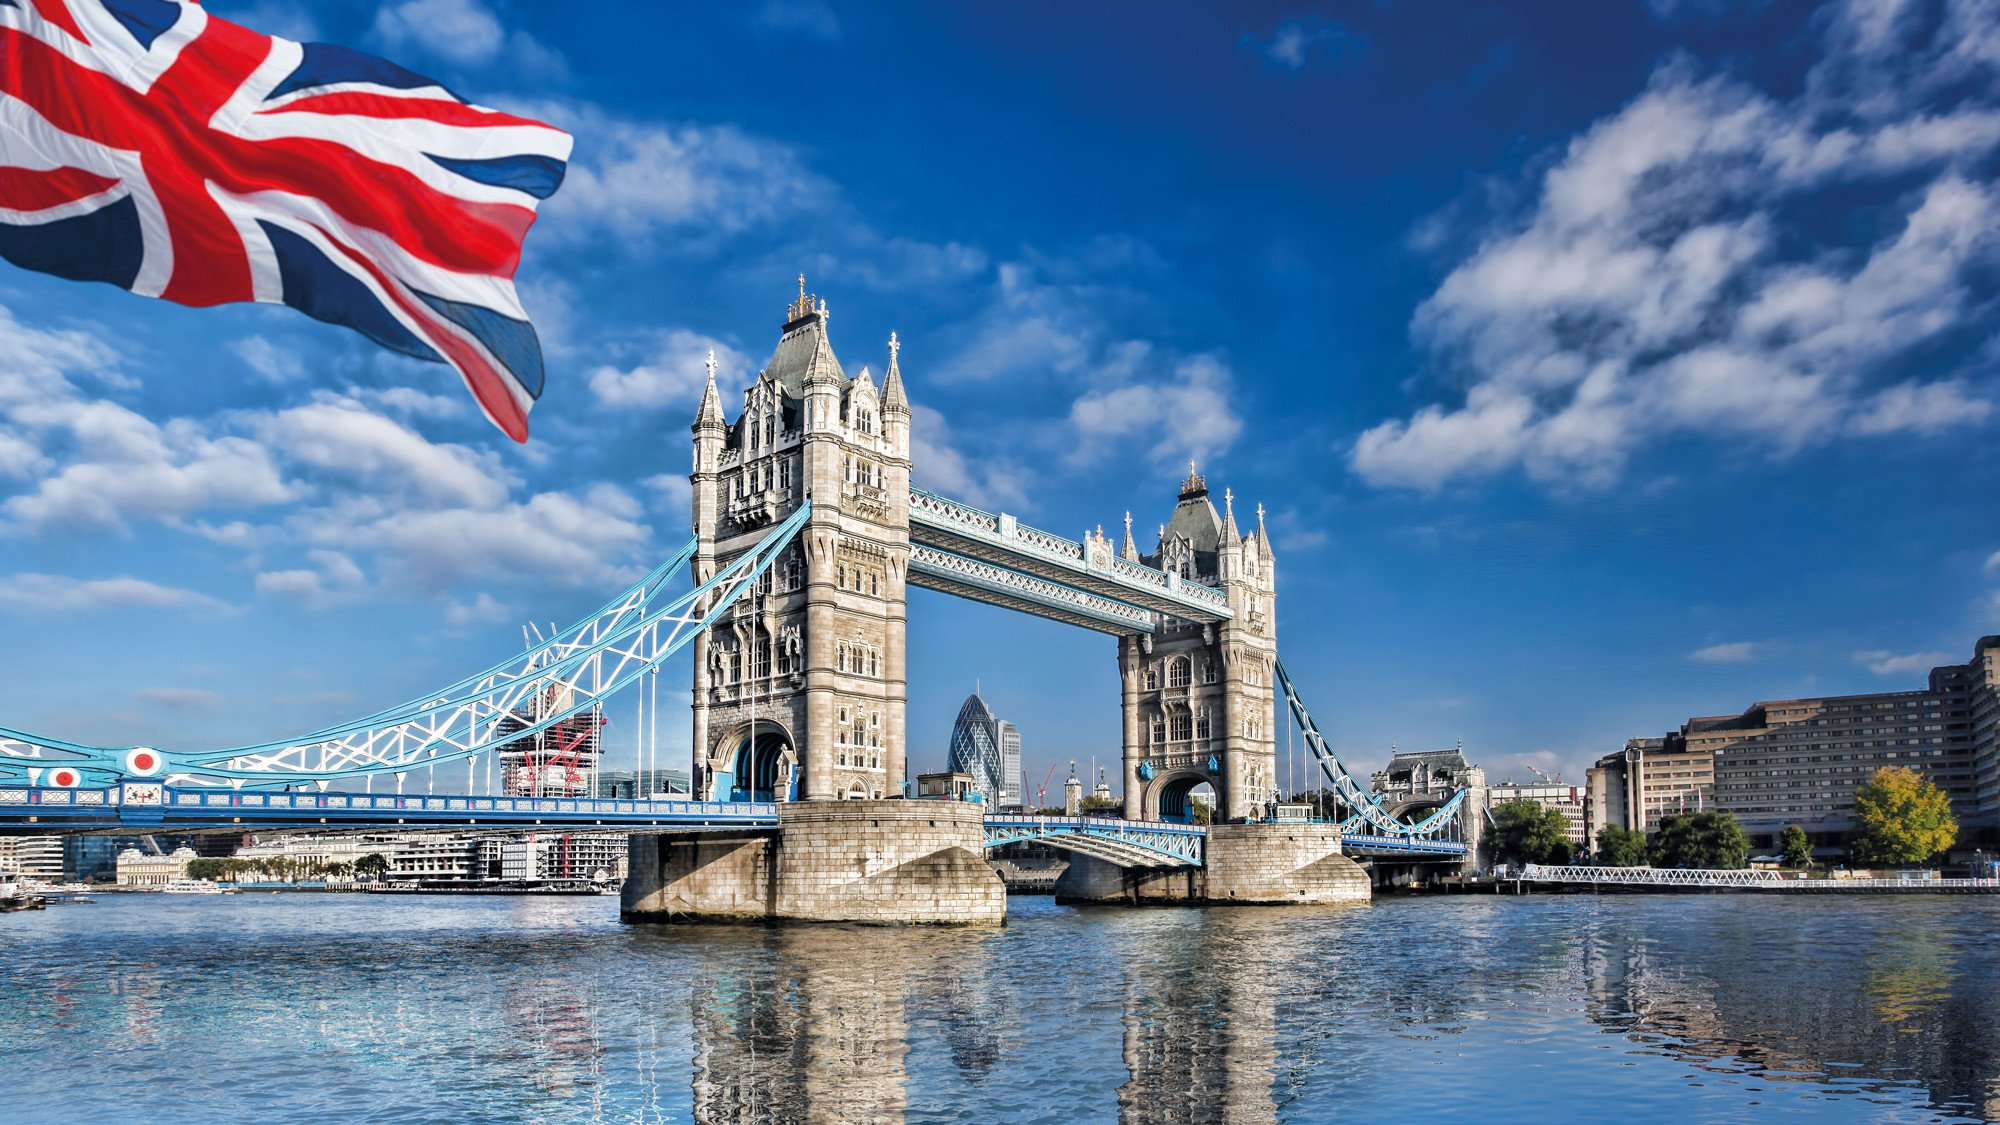 Tower Bridge in London mit Flagge